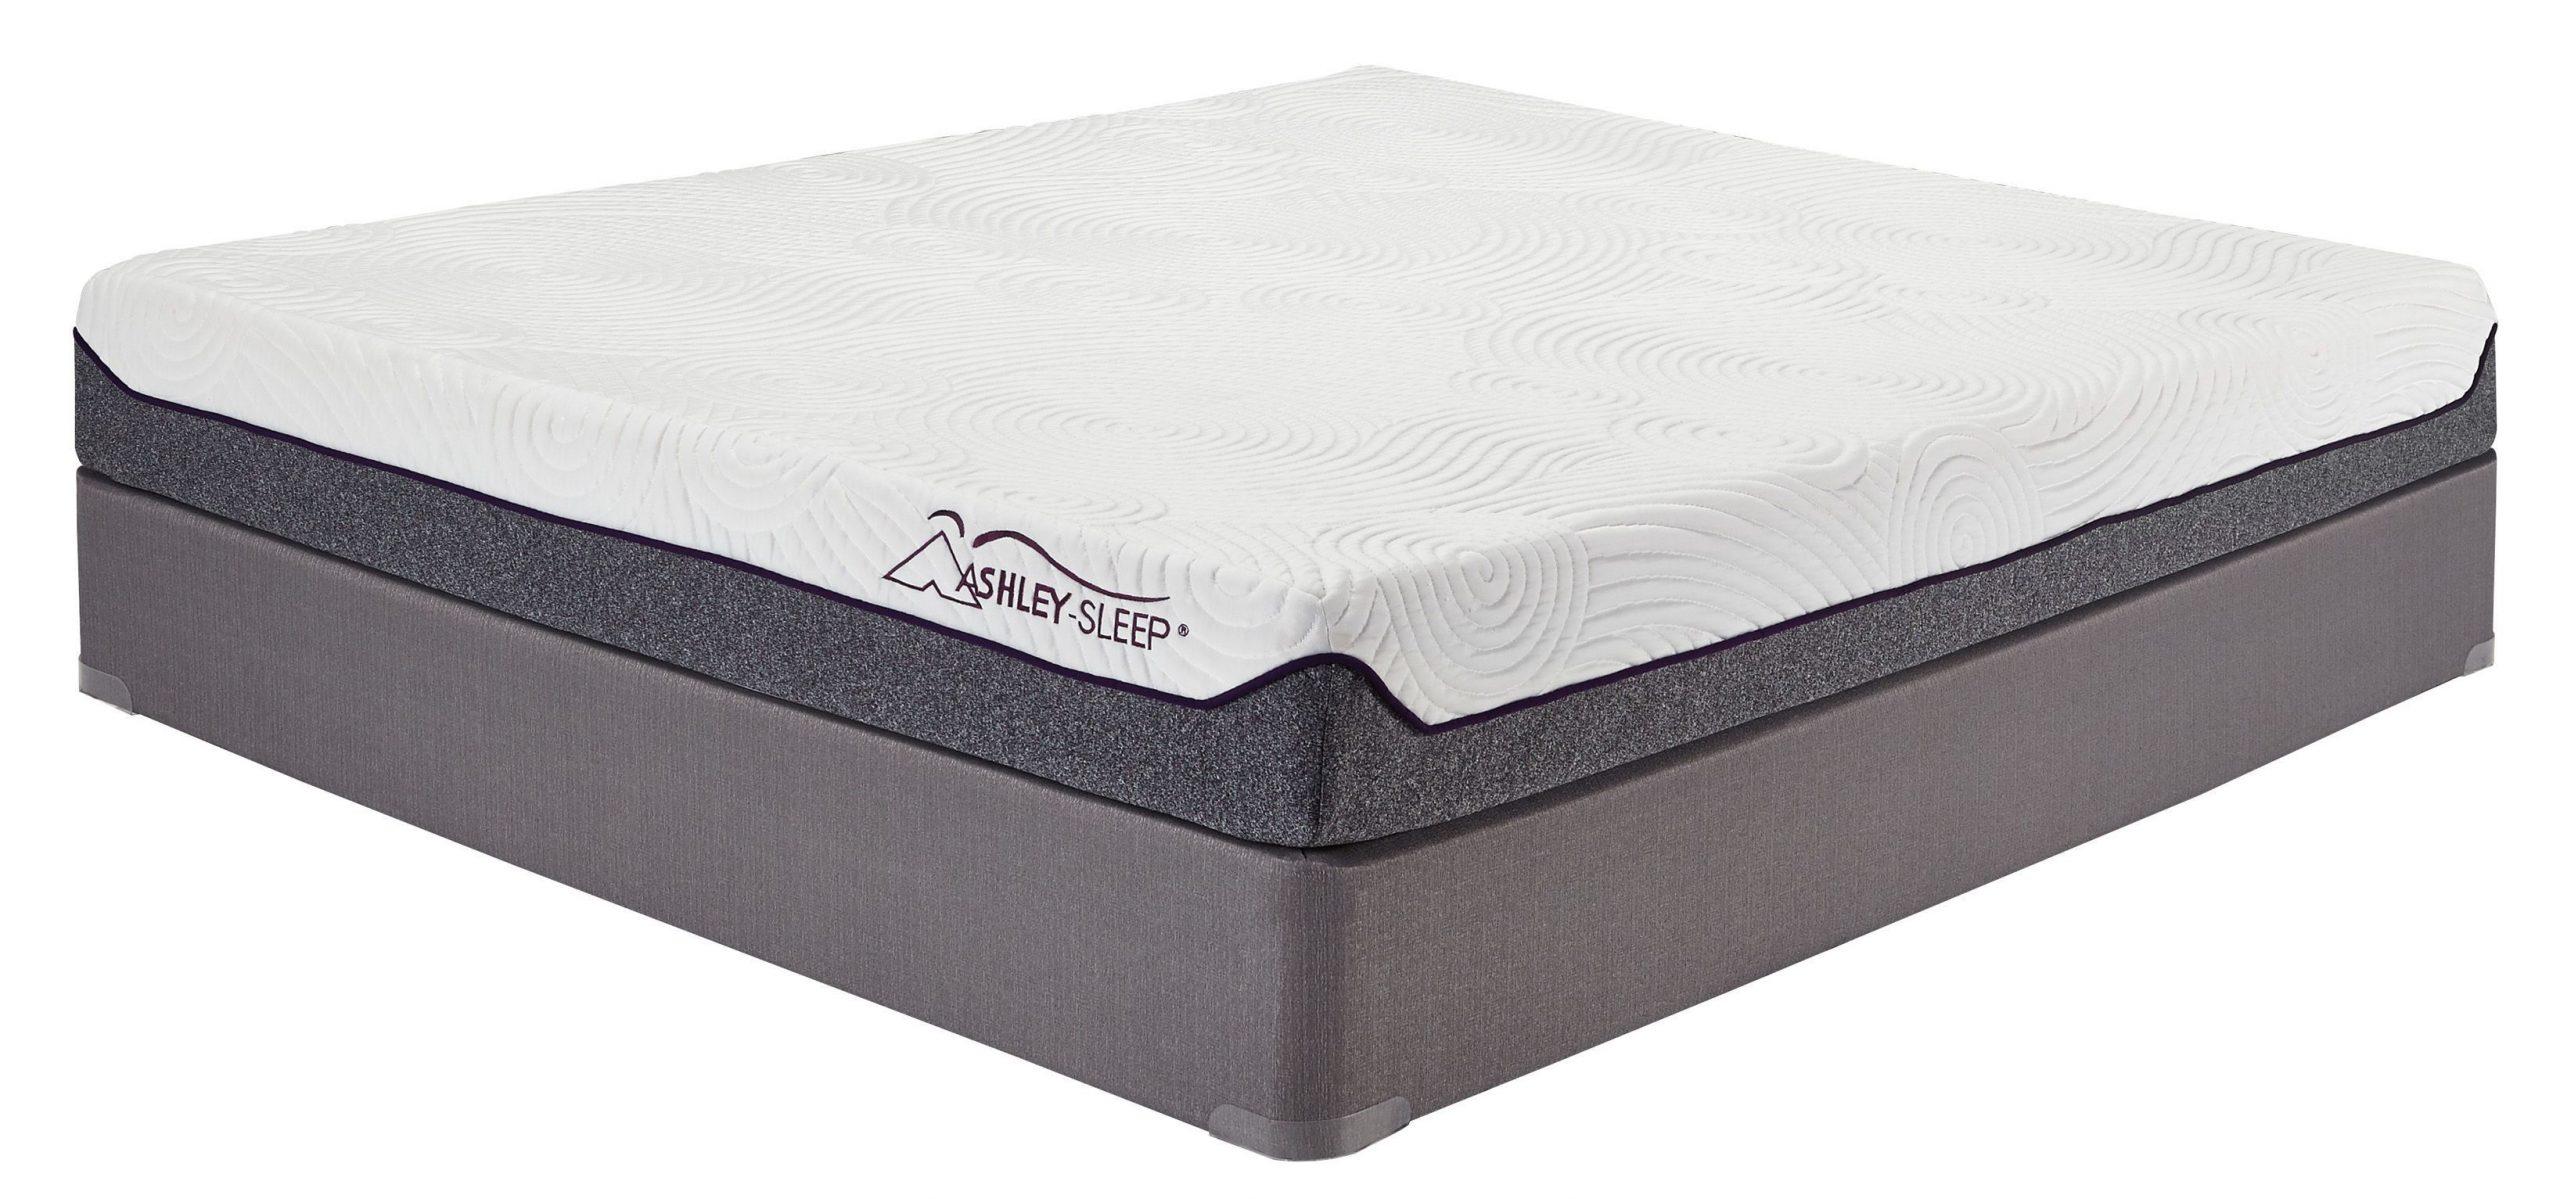 In What Ways A Memory Foam Mattress Improves Slumber?